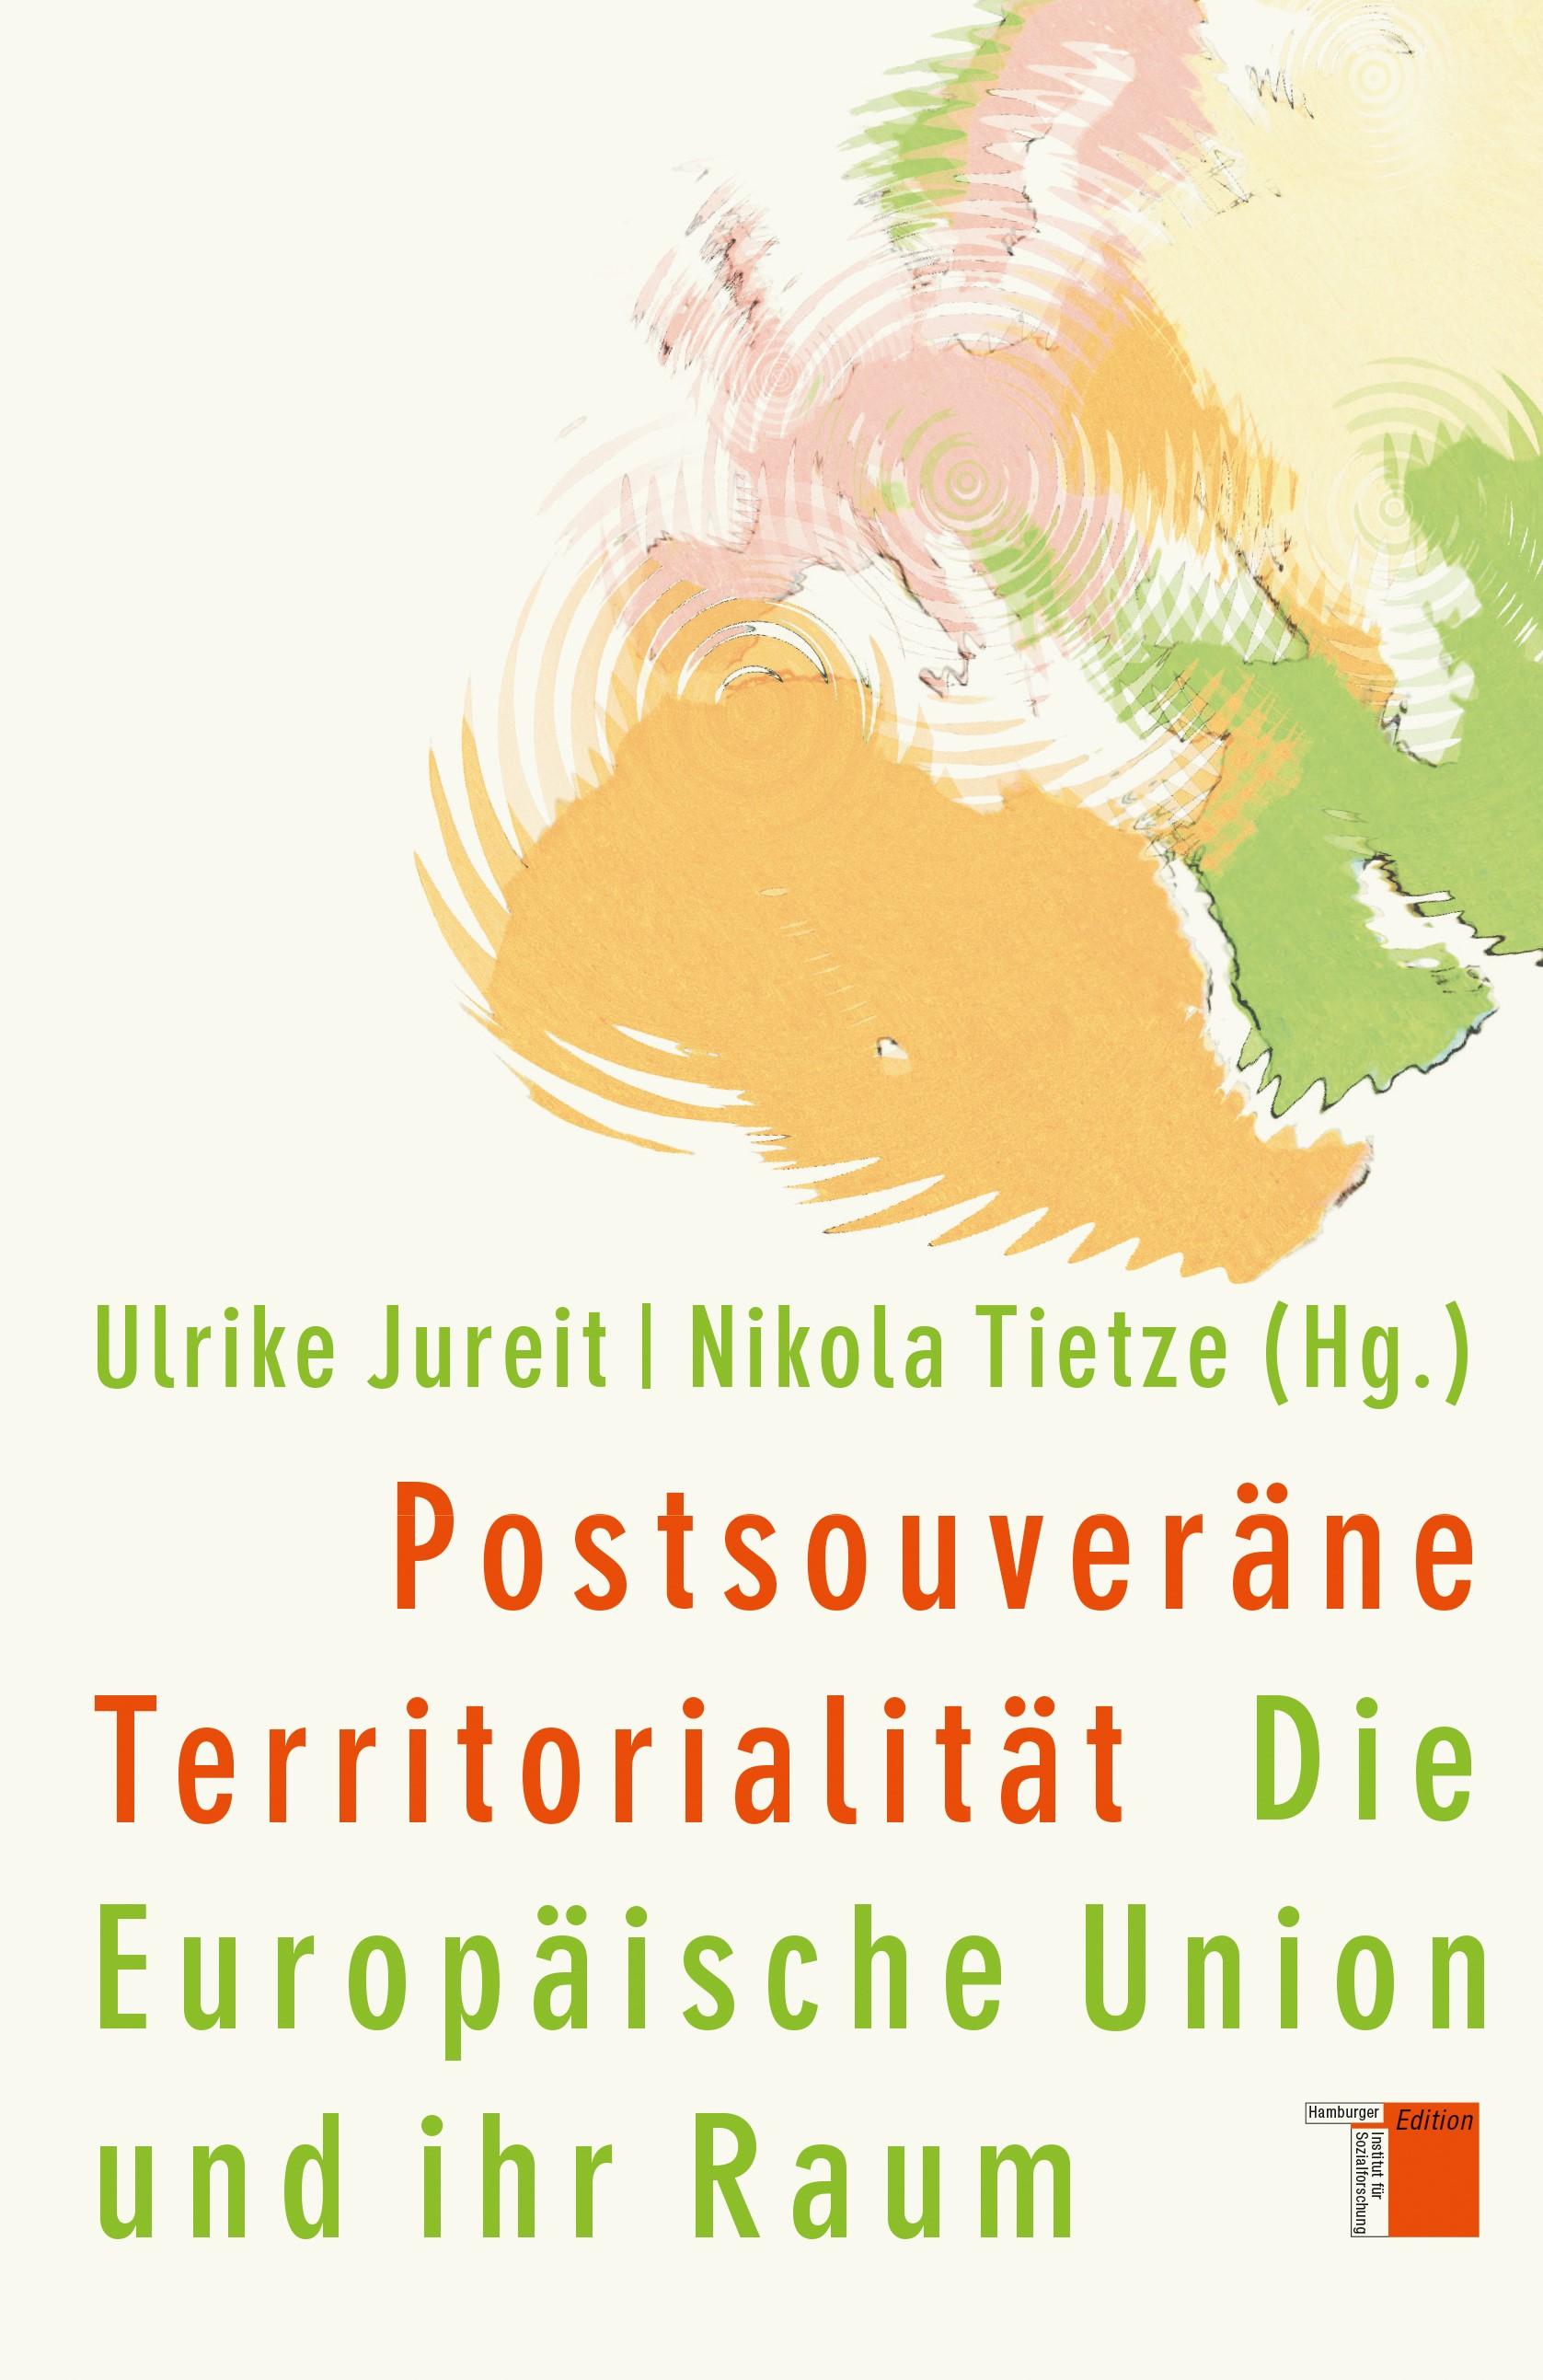 Postsouveräne Territorialität | Jureit / Tietze, 2015 | Buch (Cover)